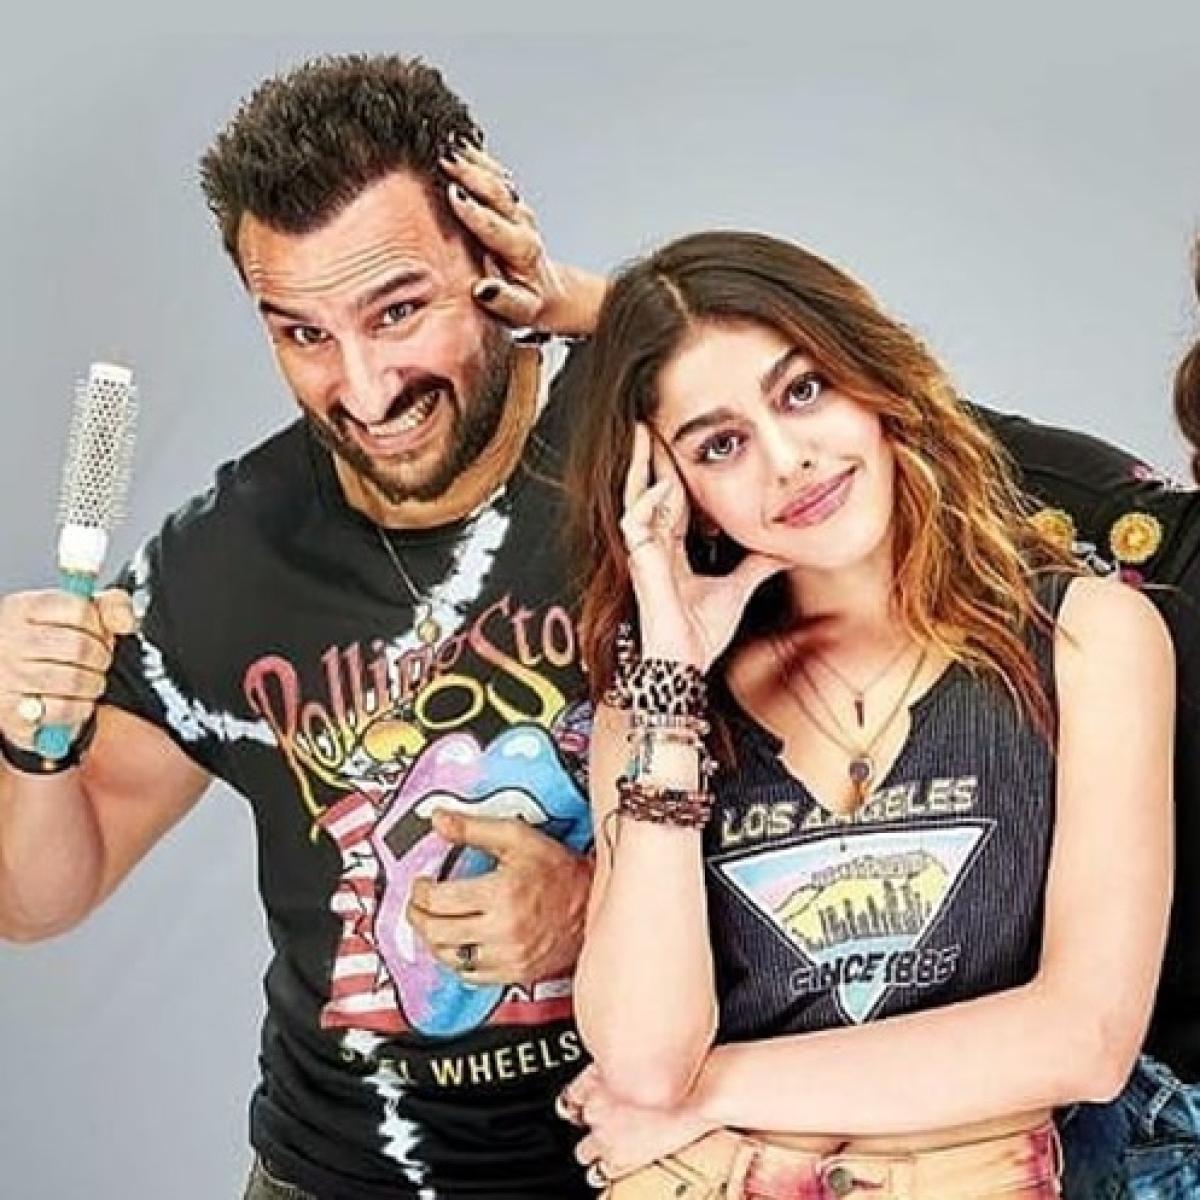 Jawaani Jaaneman trailer: Saif Ali Khan, Tabu's quirky rom-com out all set to tickle your funny bones on Jan 31